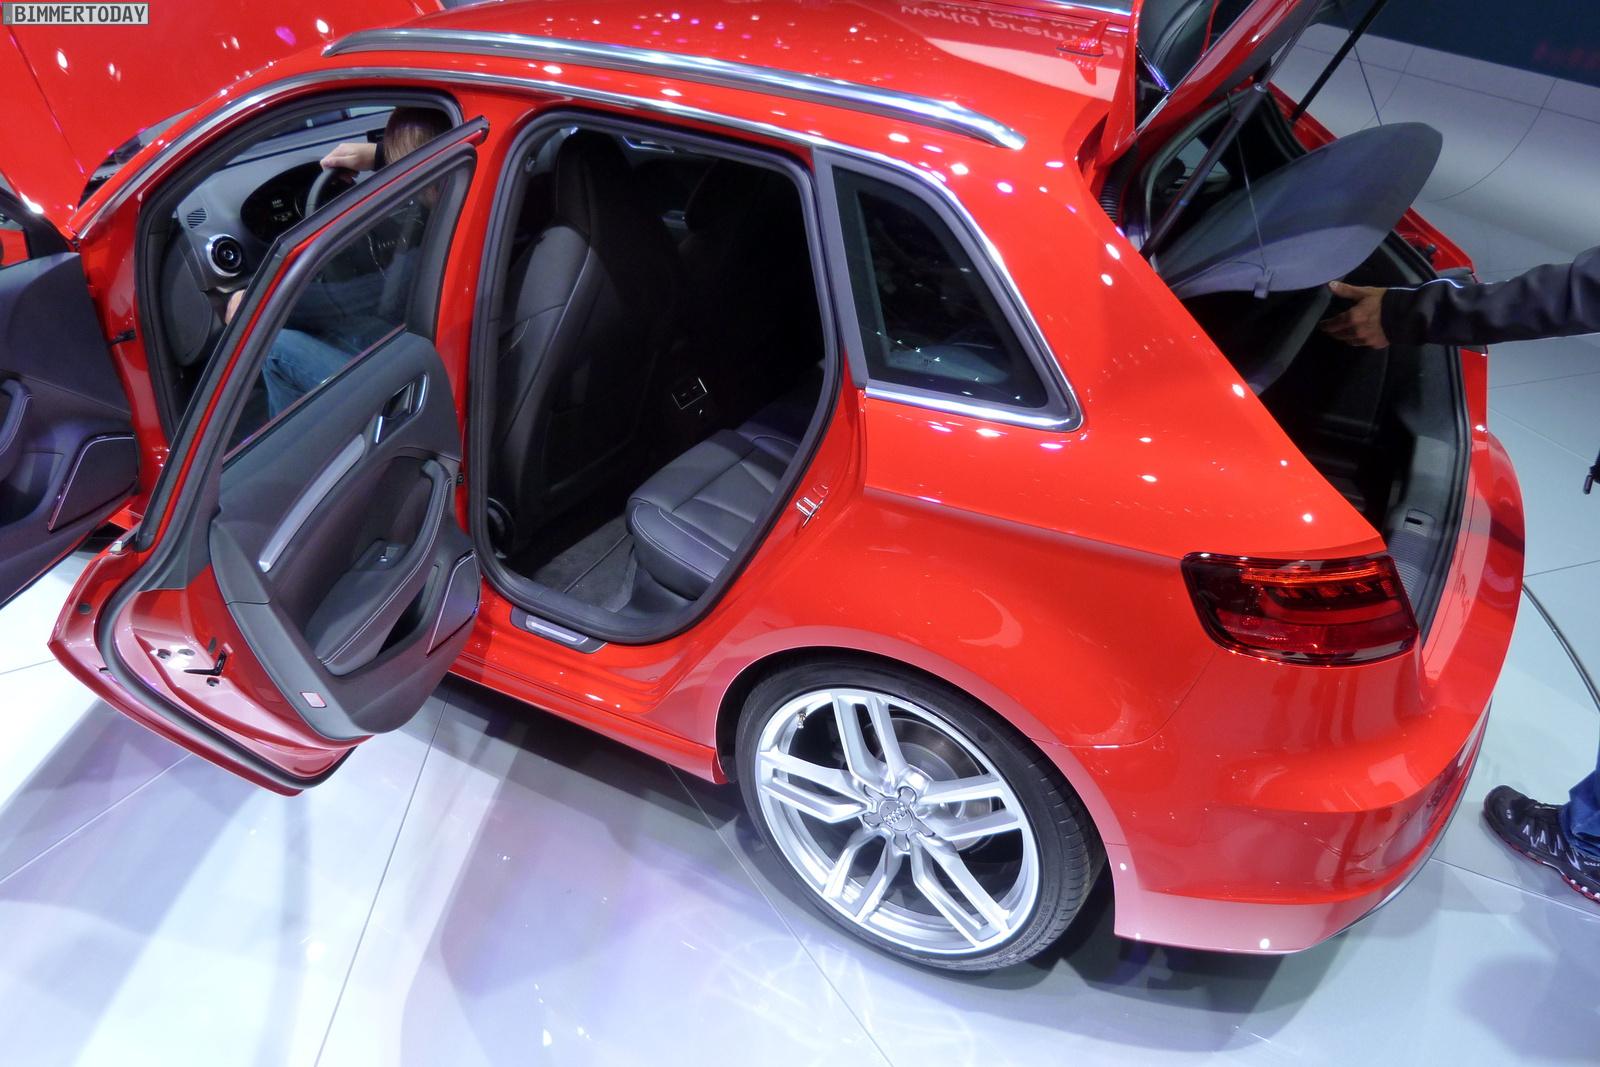 Audi A3 Sportback 2 0 Tdi Paris 2012 15